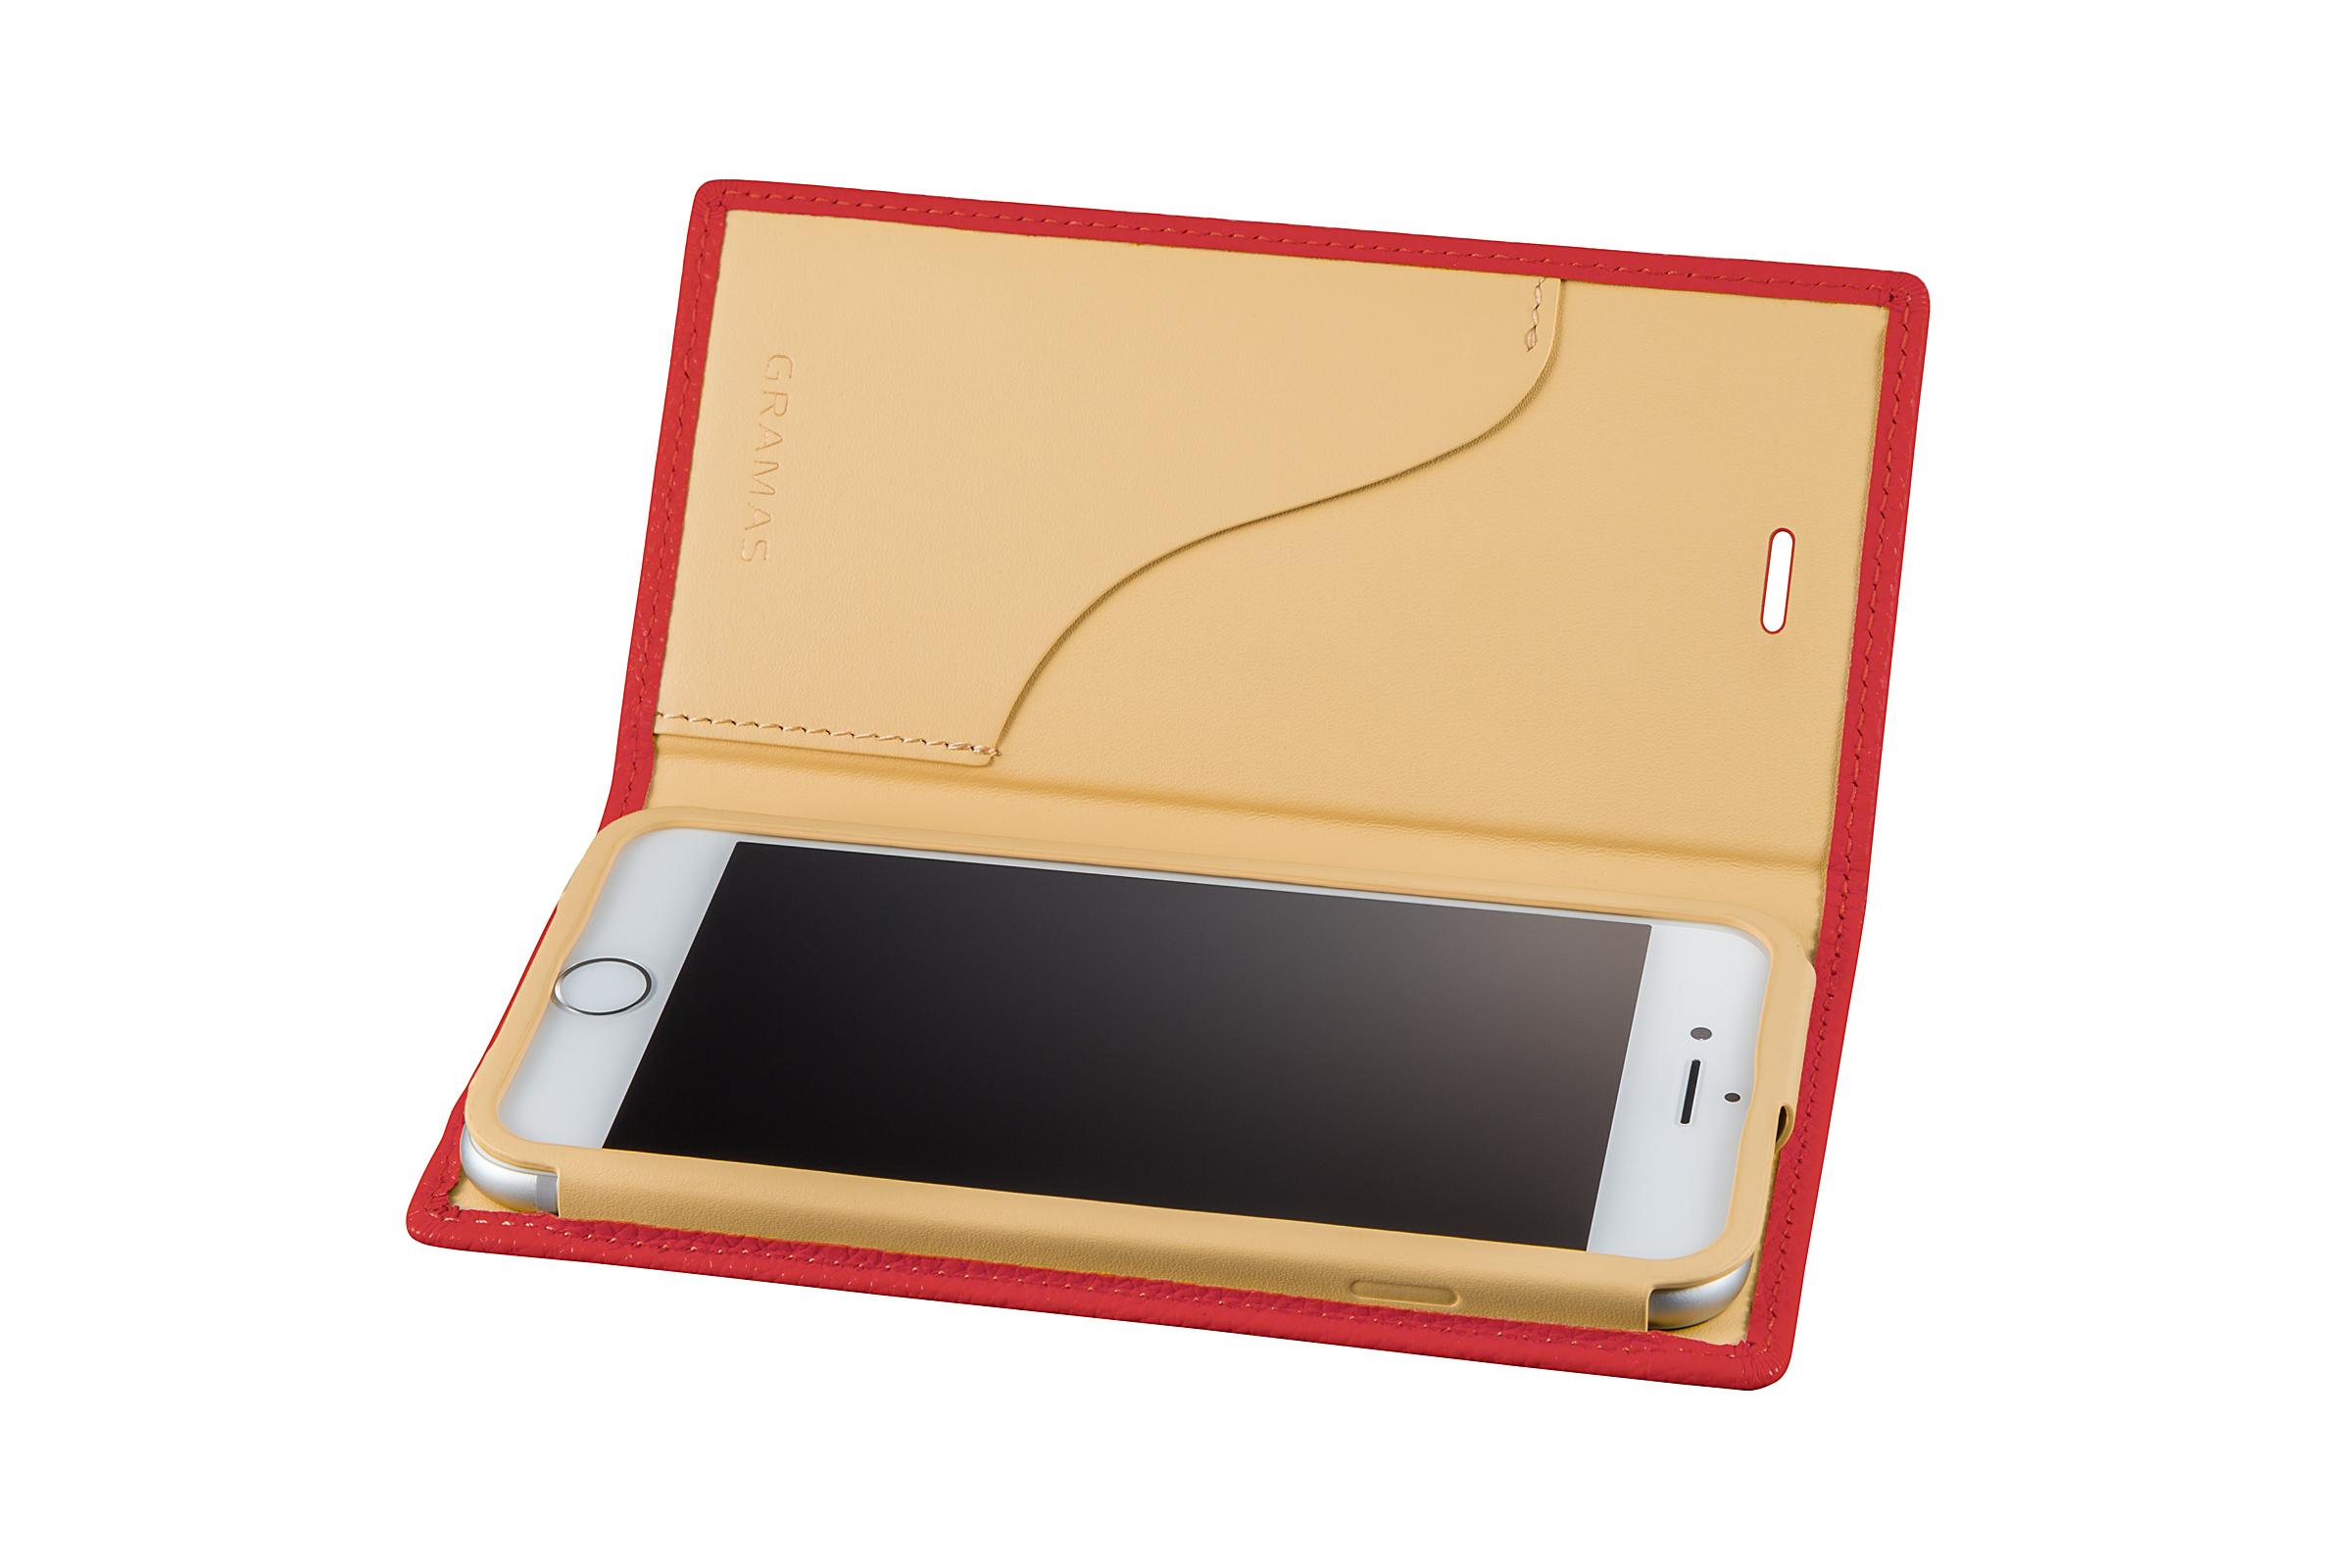 GRAMAS Shrunken-calf Full Leather Case for iPhone 7(Pink) シュランケンカーフ 手帳型フルレザーケース - 画像3